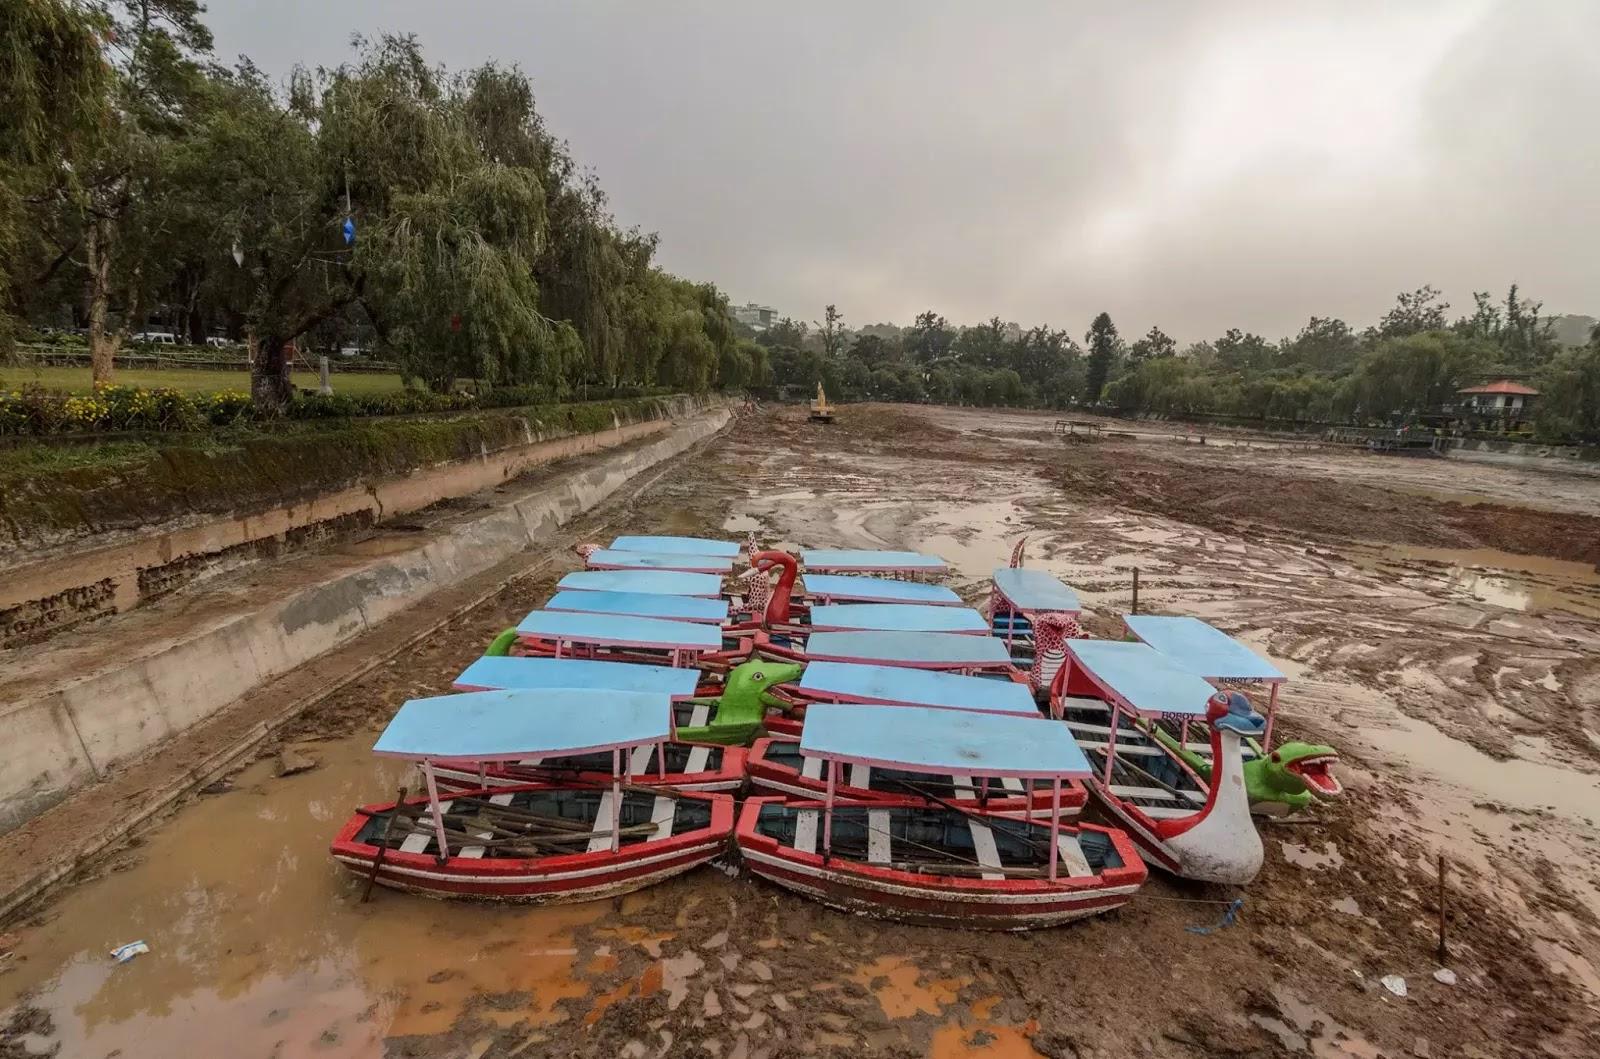 Muddy Bottom The Dredging of Burnham Lake 2013 Baguio City Cordillera Administrative Region Philippines